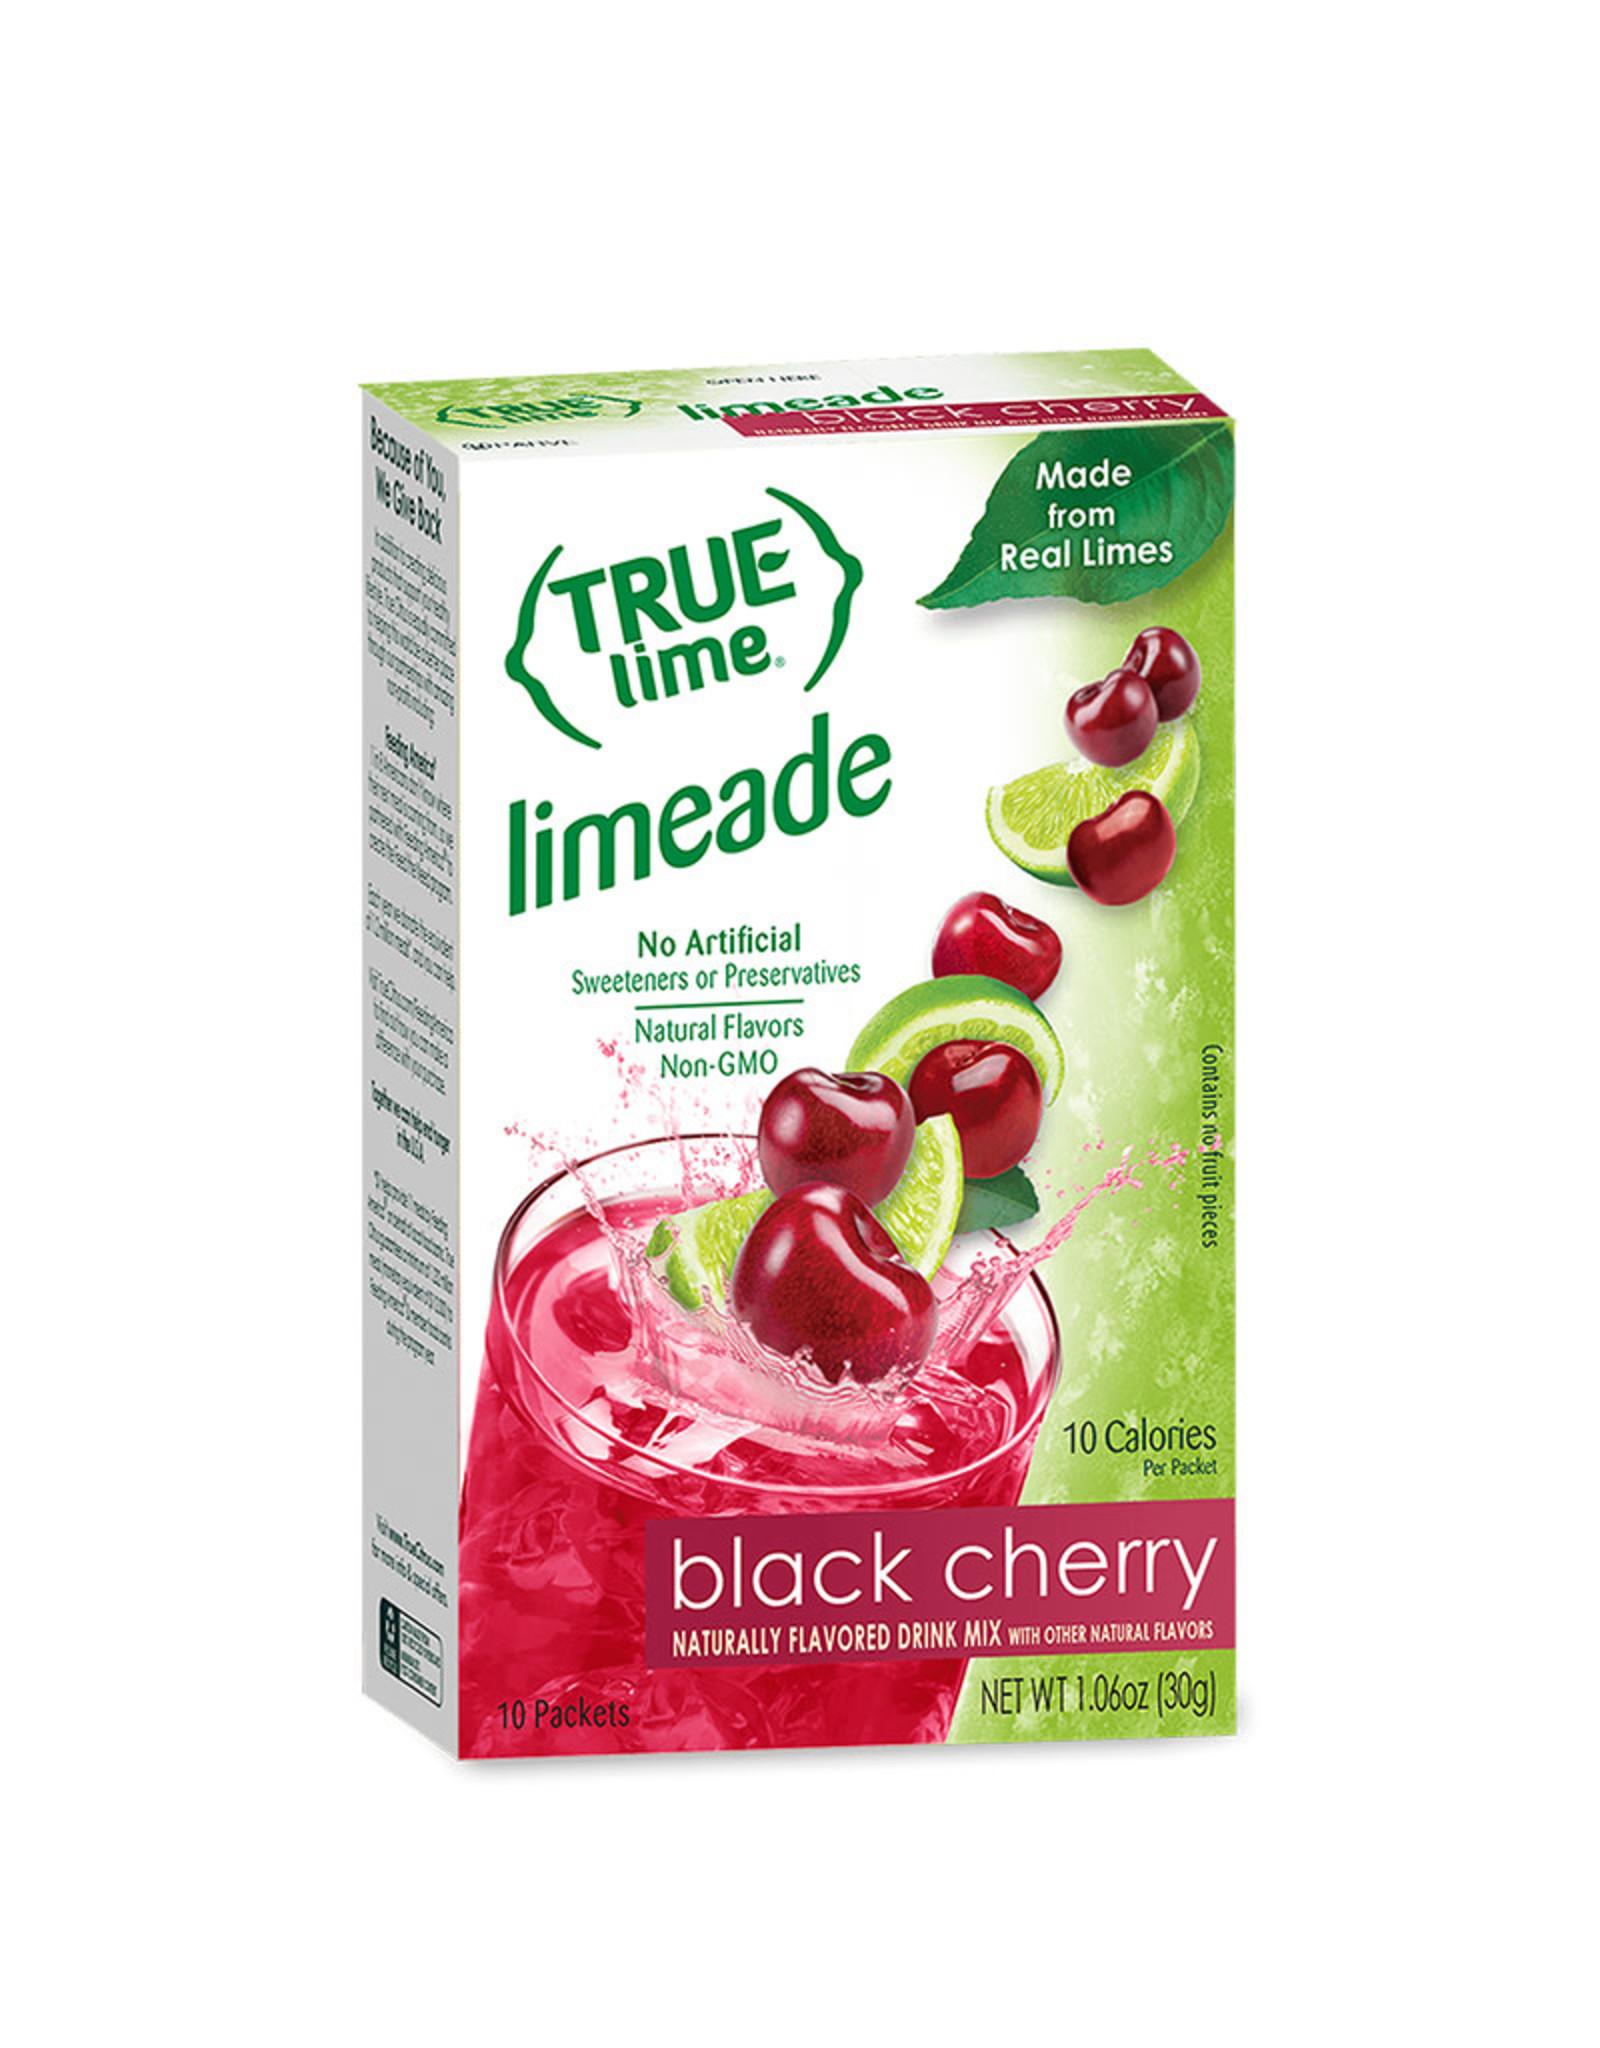 True Citrus True Citrus - True Lime, Black Cherry Limeade (10pk)